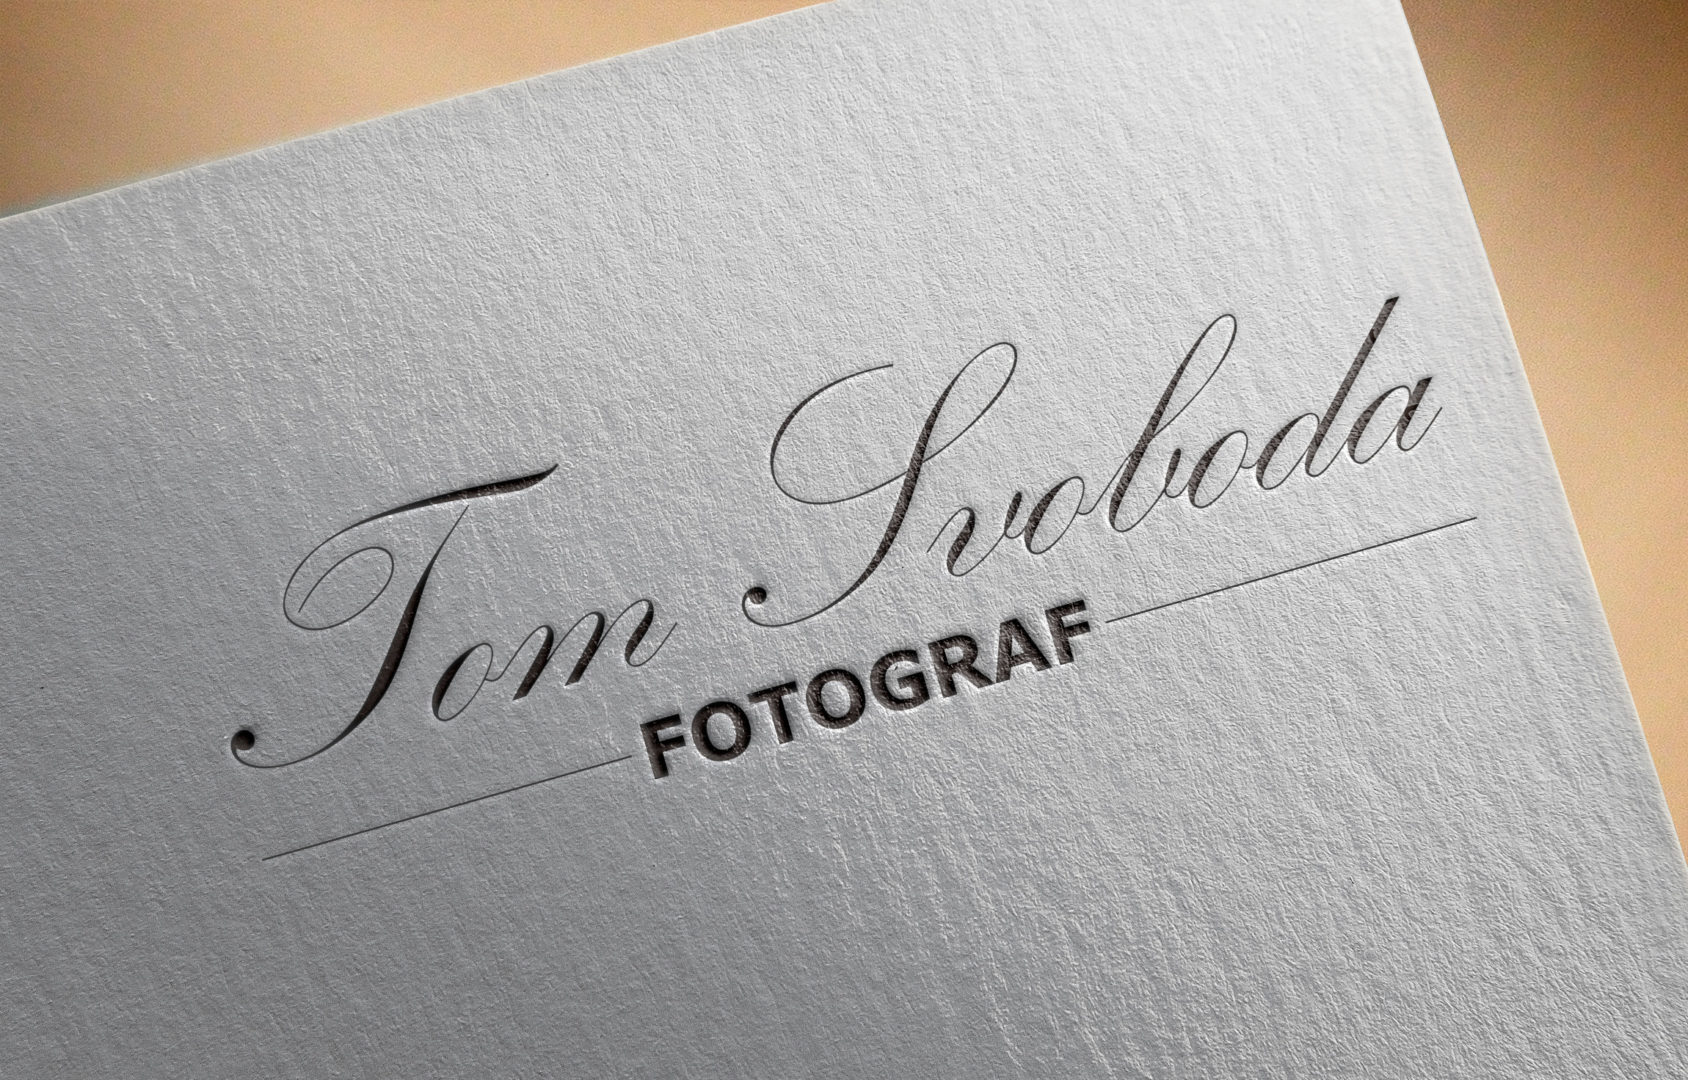 Adatto.cz, tvorba loga - Tom Svoboda Fotograf